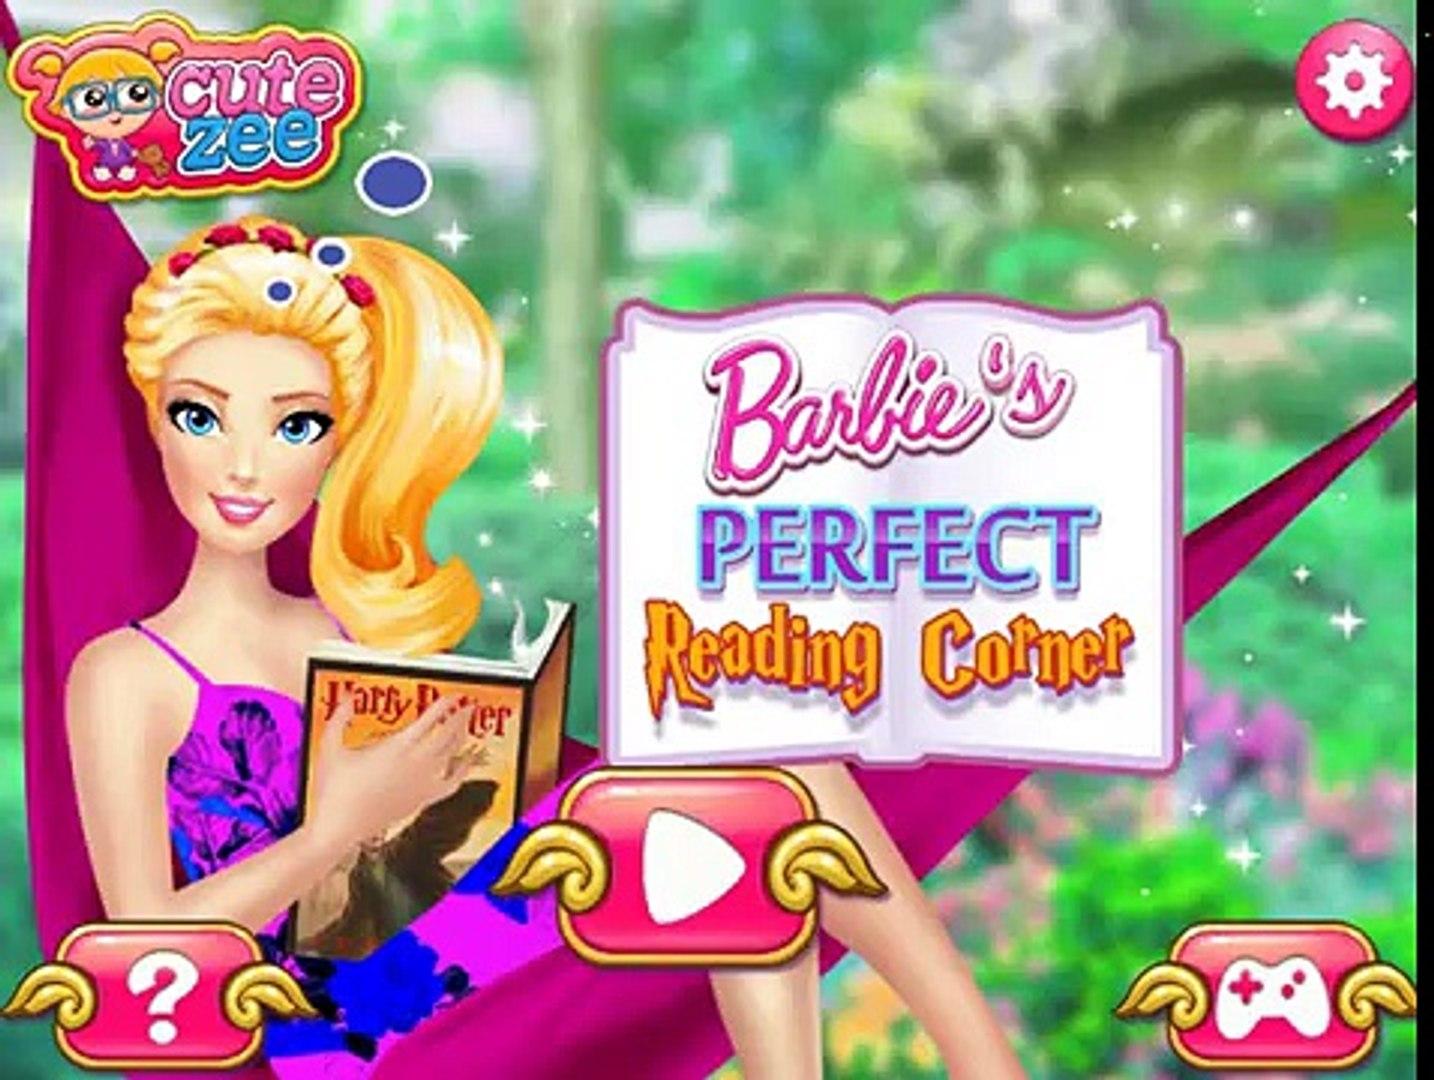 Barbies Perfect Reading Corner: Decorating Games - Barbies Perfect Reading Corner!